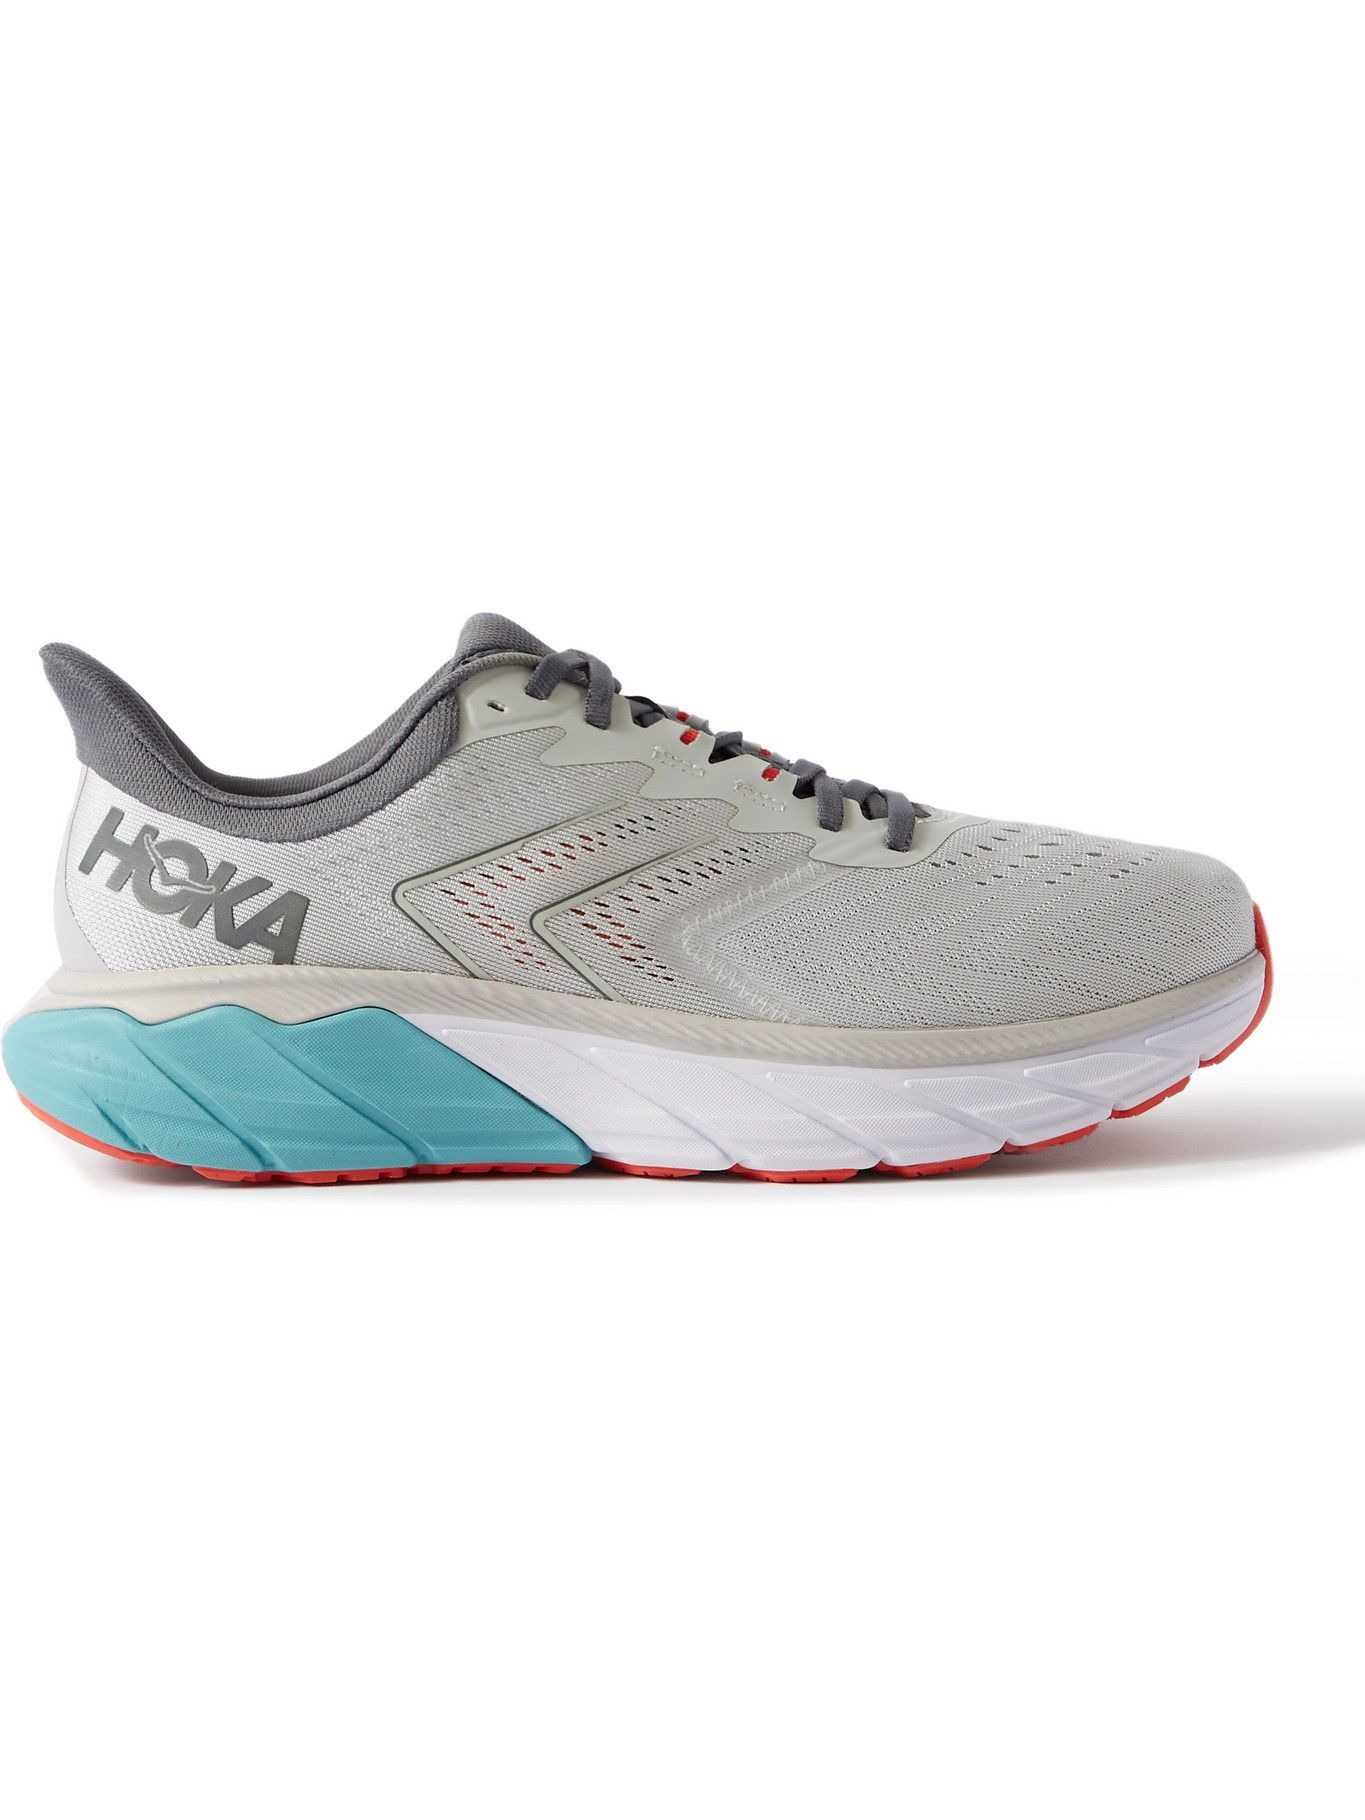 Photo: Hoka One One - Arahi 5 Rubber-Trimmed Mesh Running Sneakers - Gray